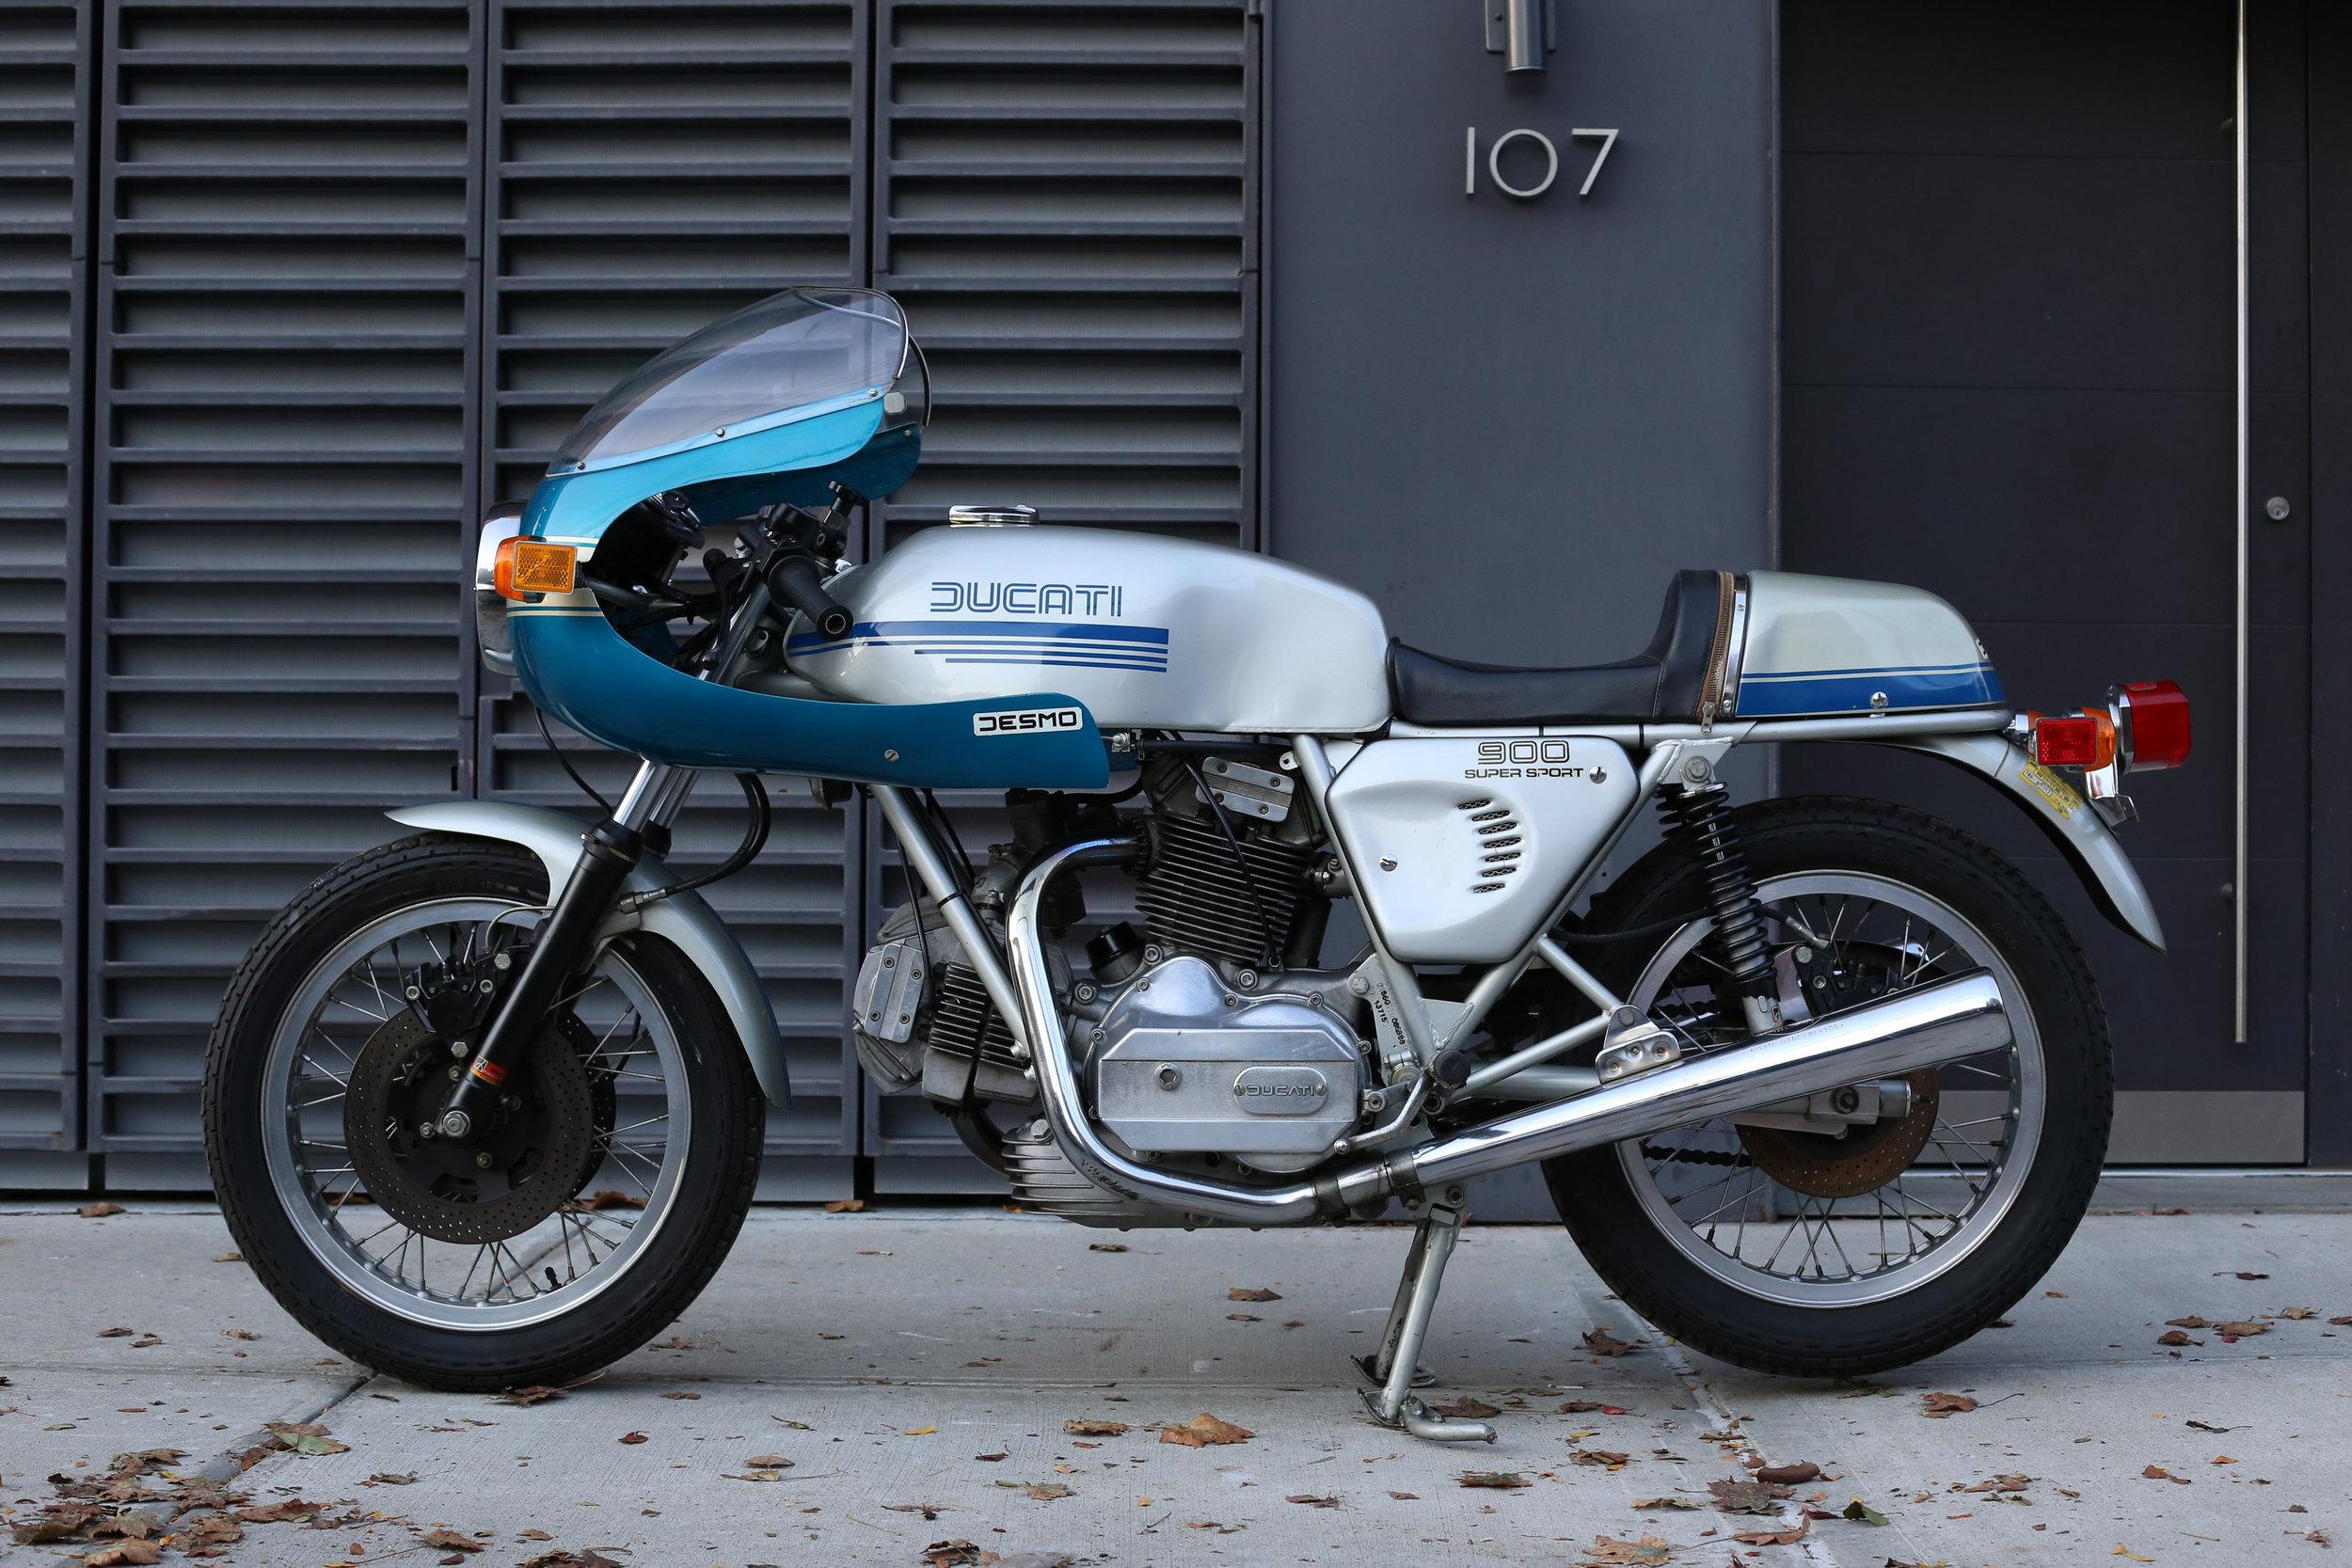 1977 Ducati 900SS side profile